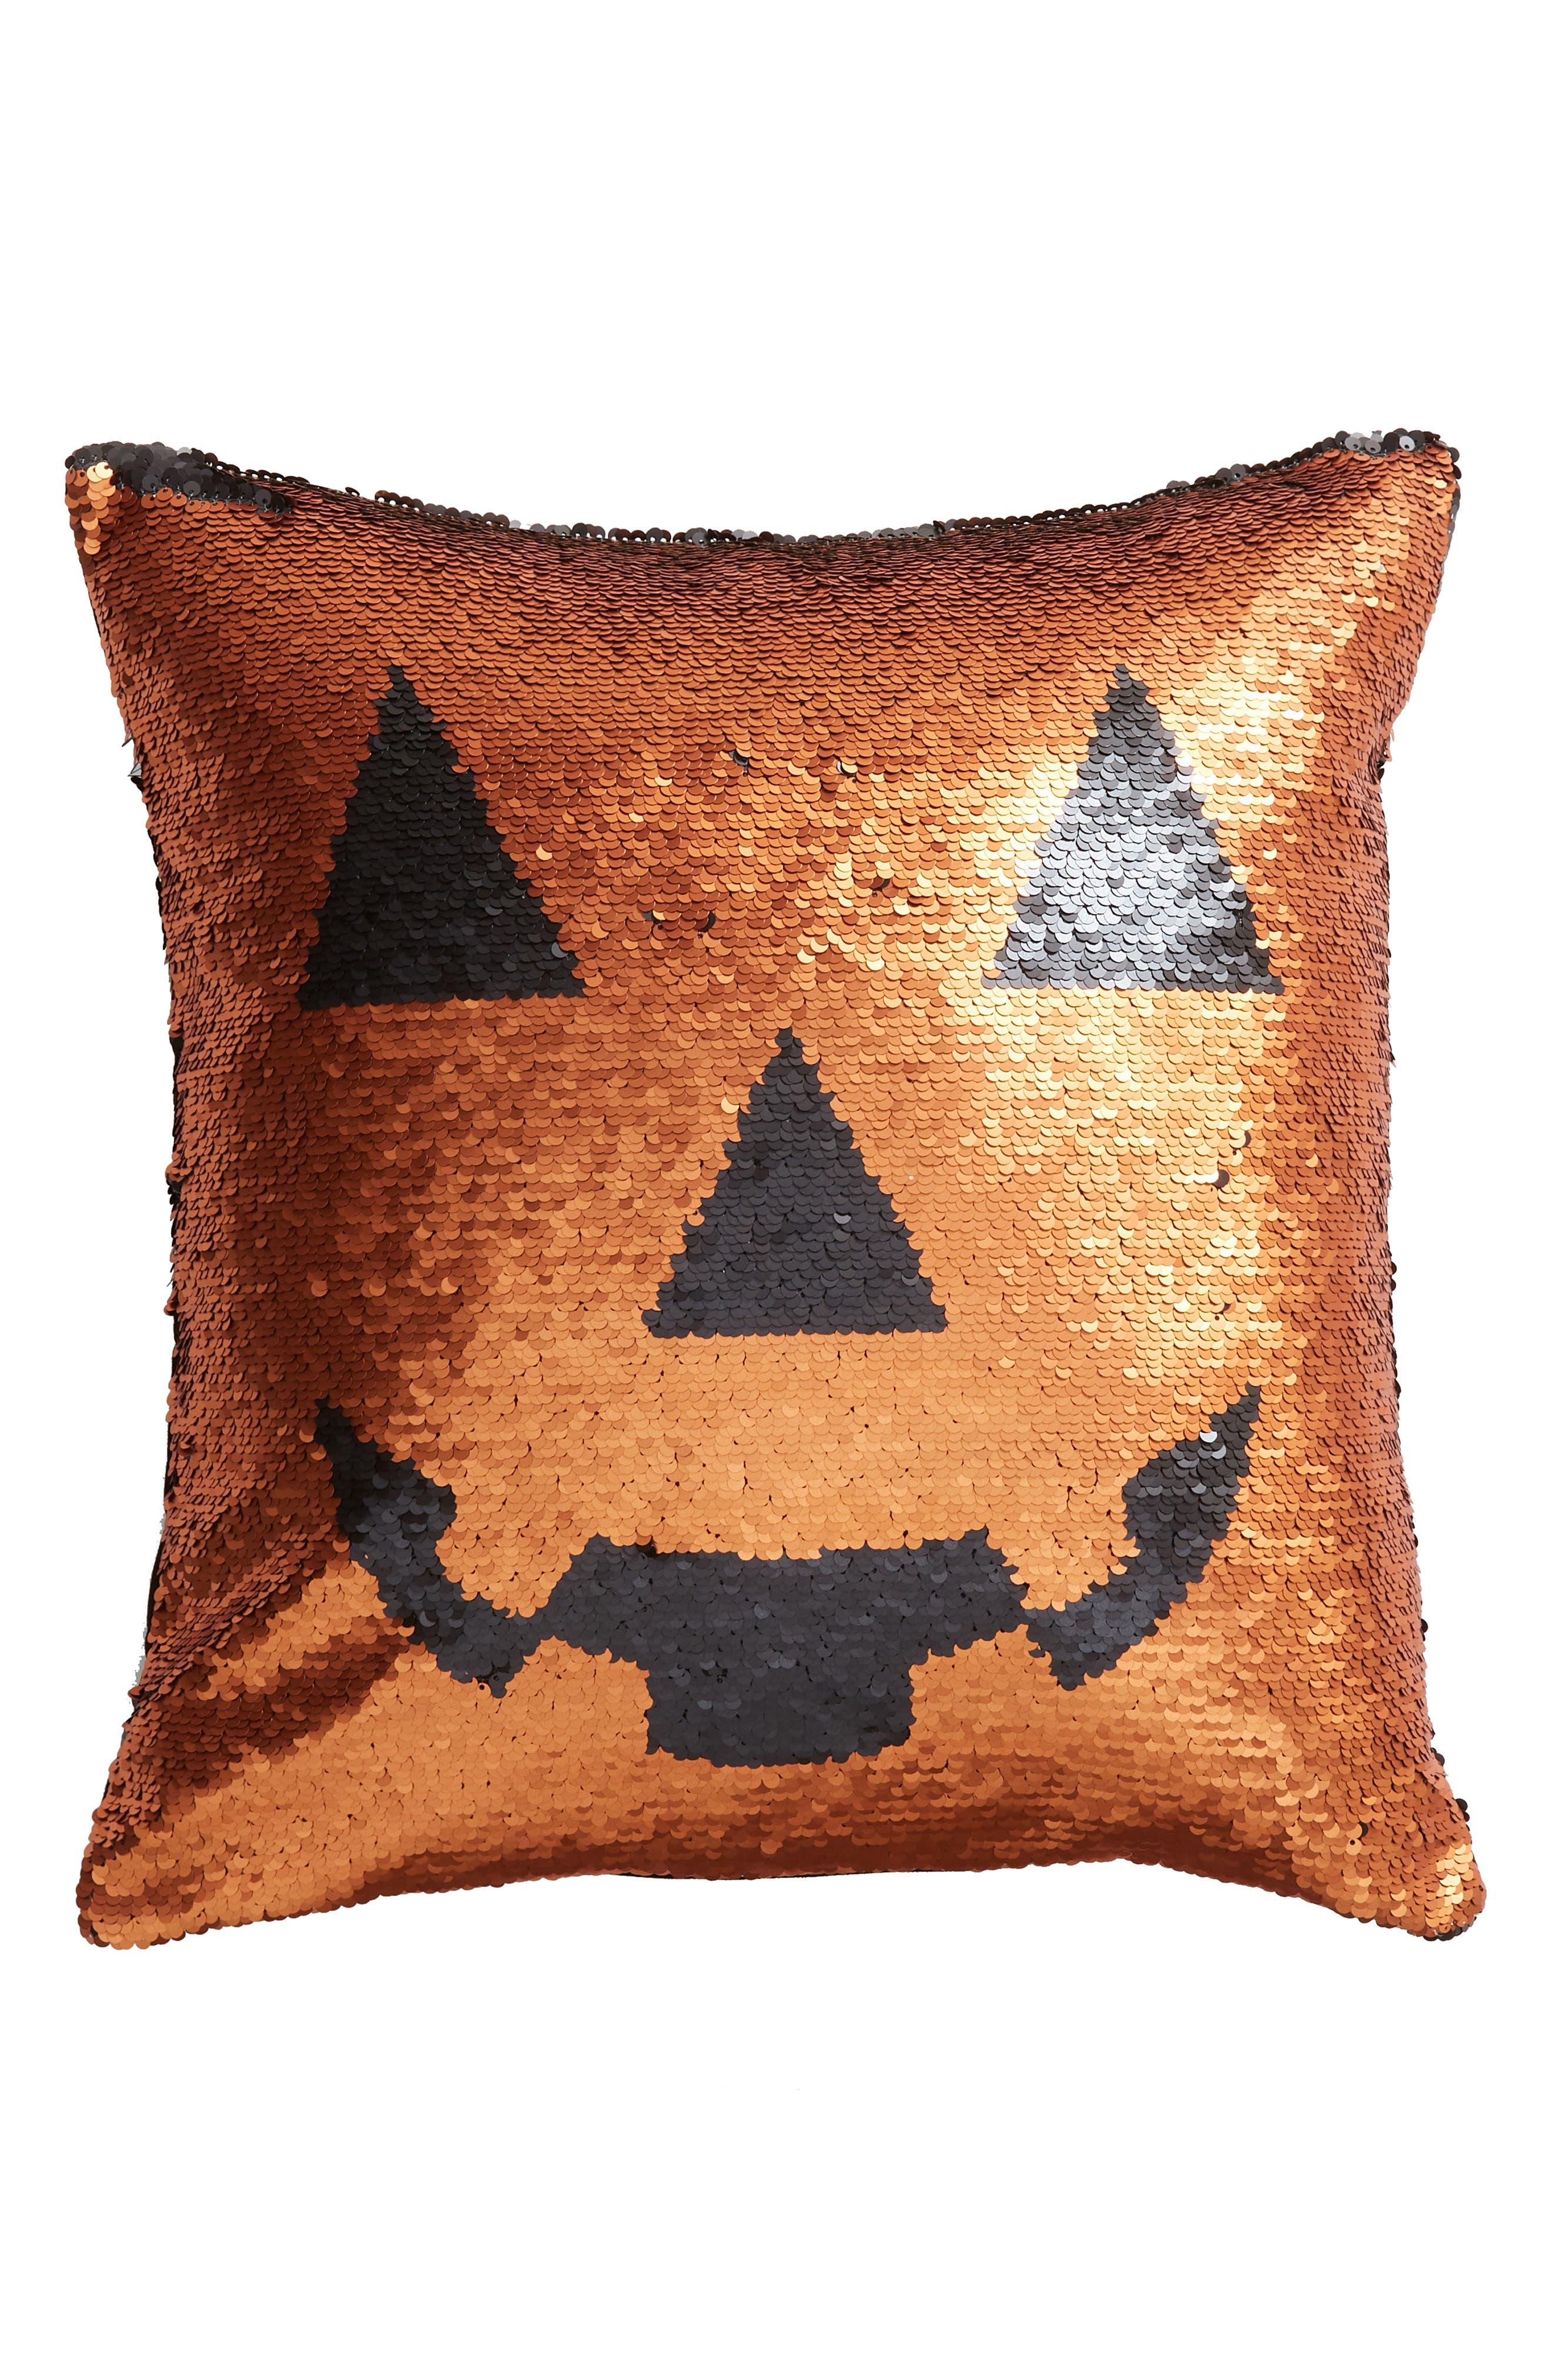 Pumpkin Sequin Accent Pillow,                         Main,                         color, 800